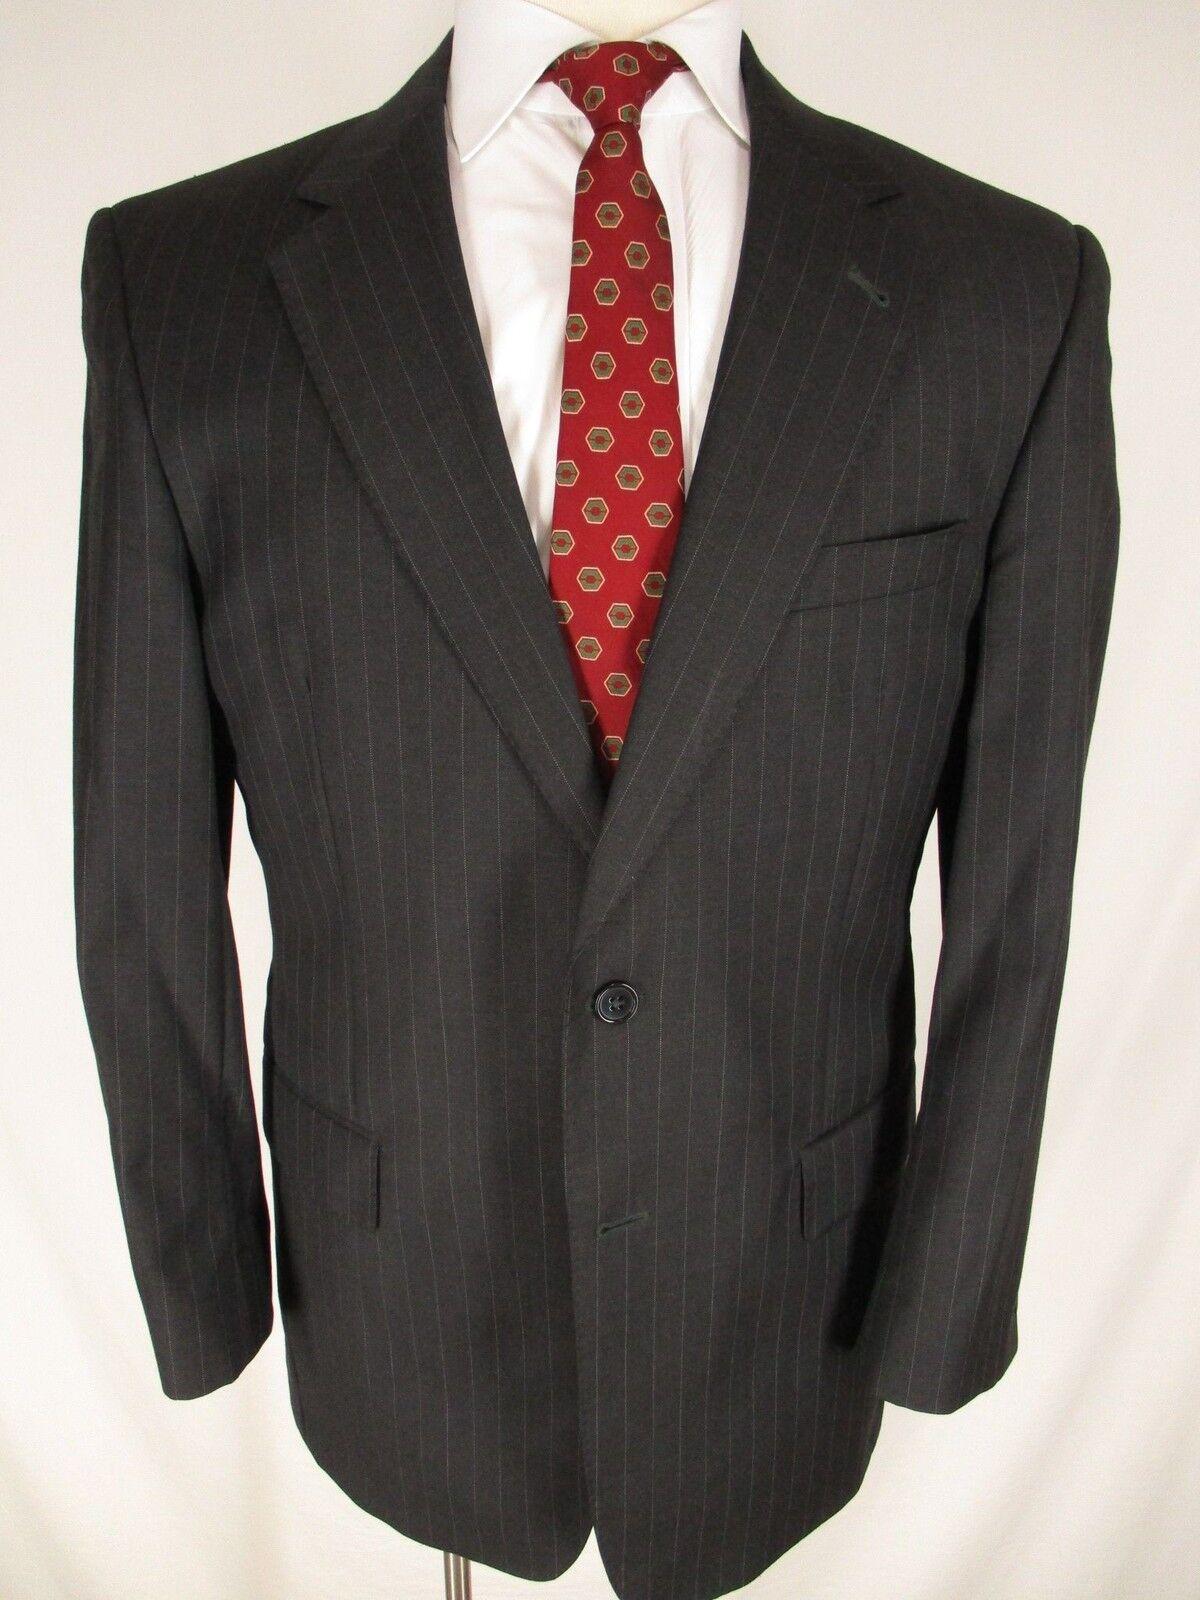 Jos A Bank Signature Gold  Herren Charcoal Stripe 2 Btn Suit 40R